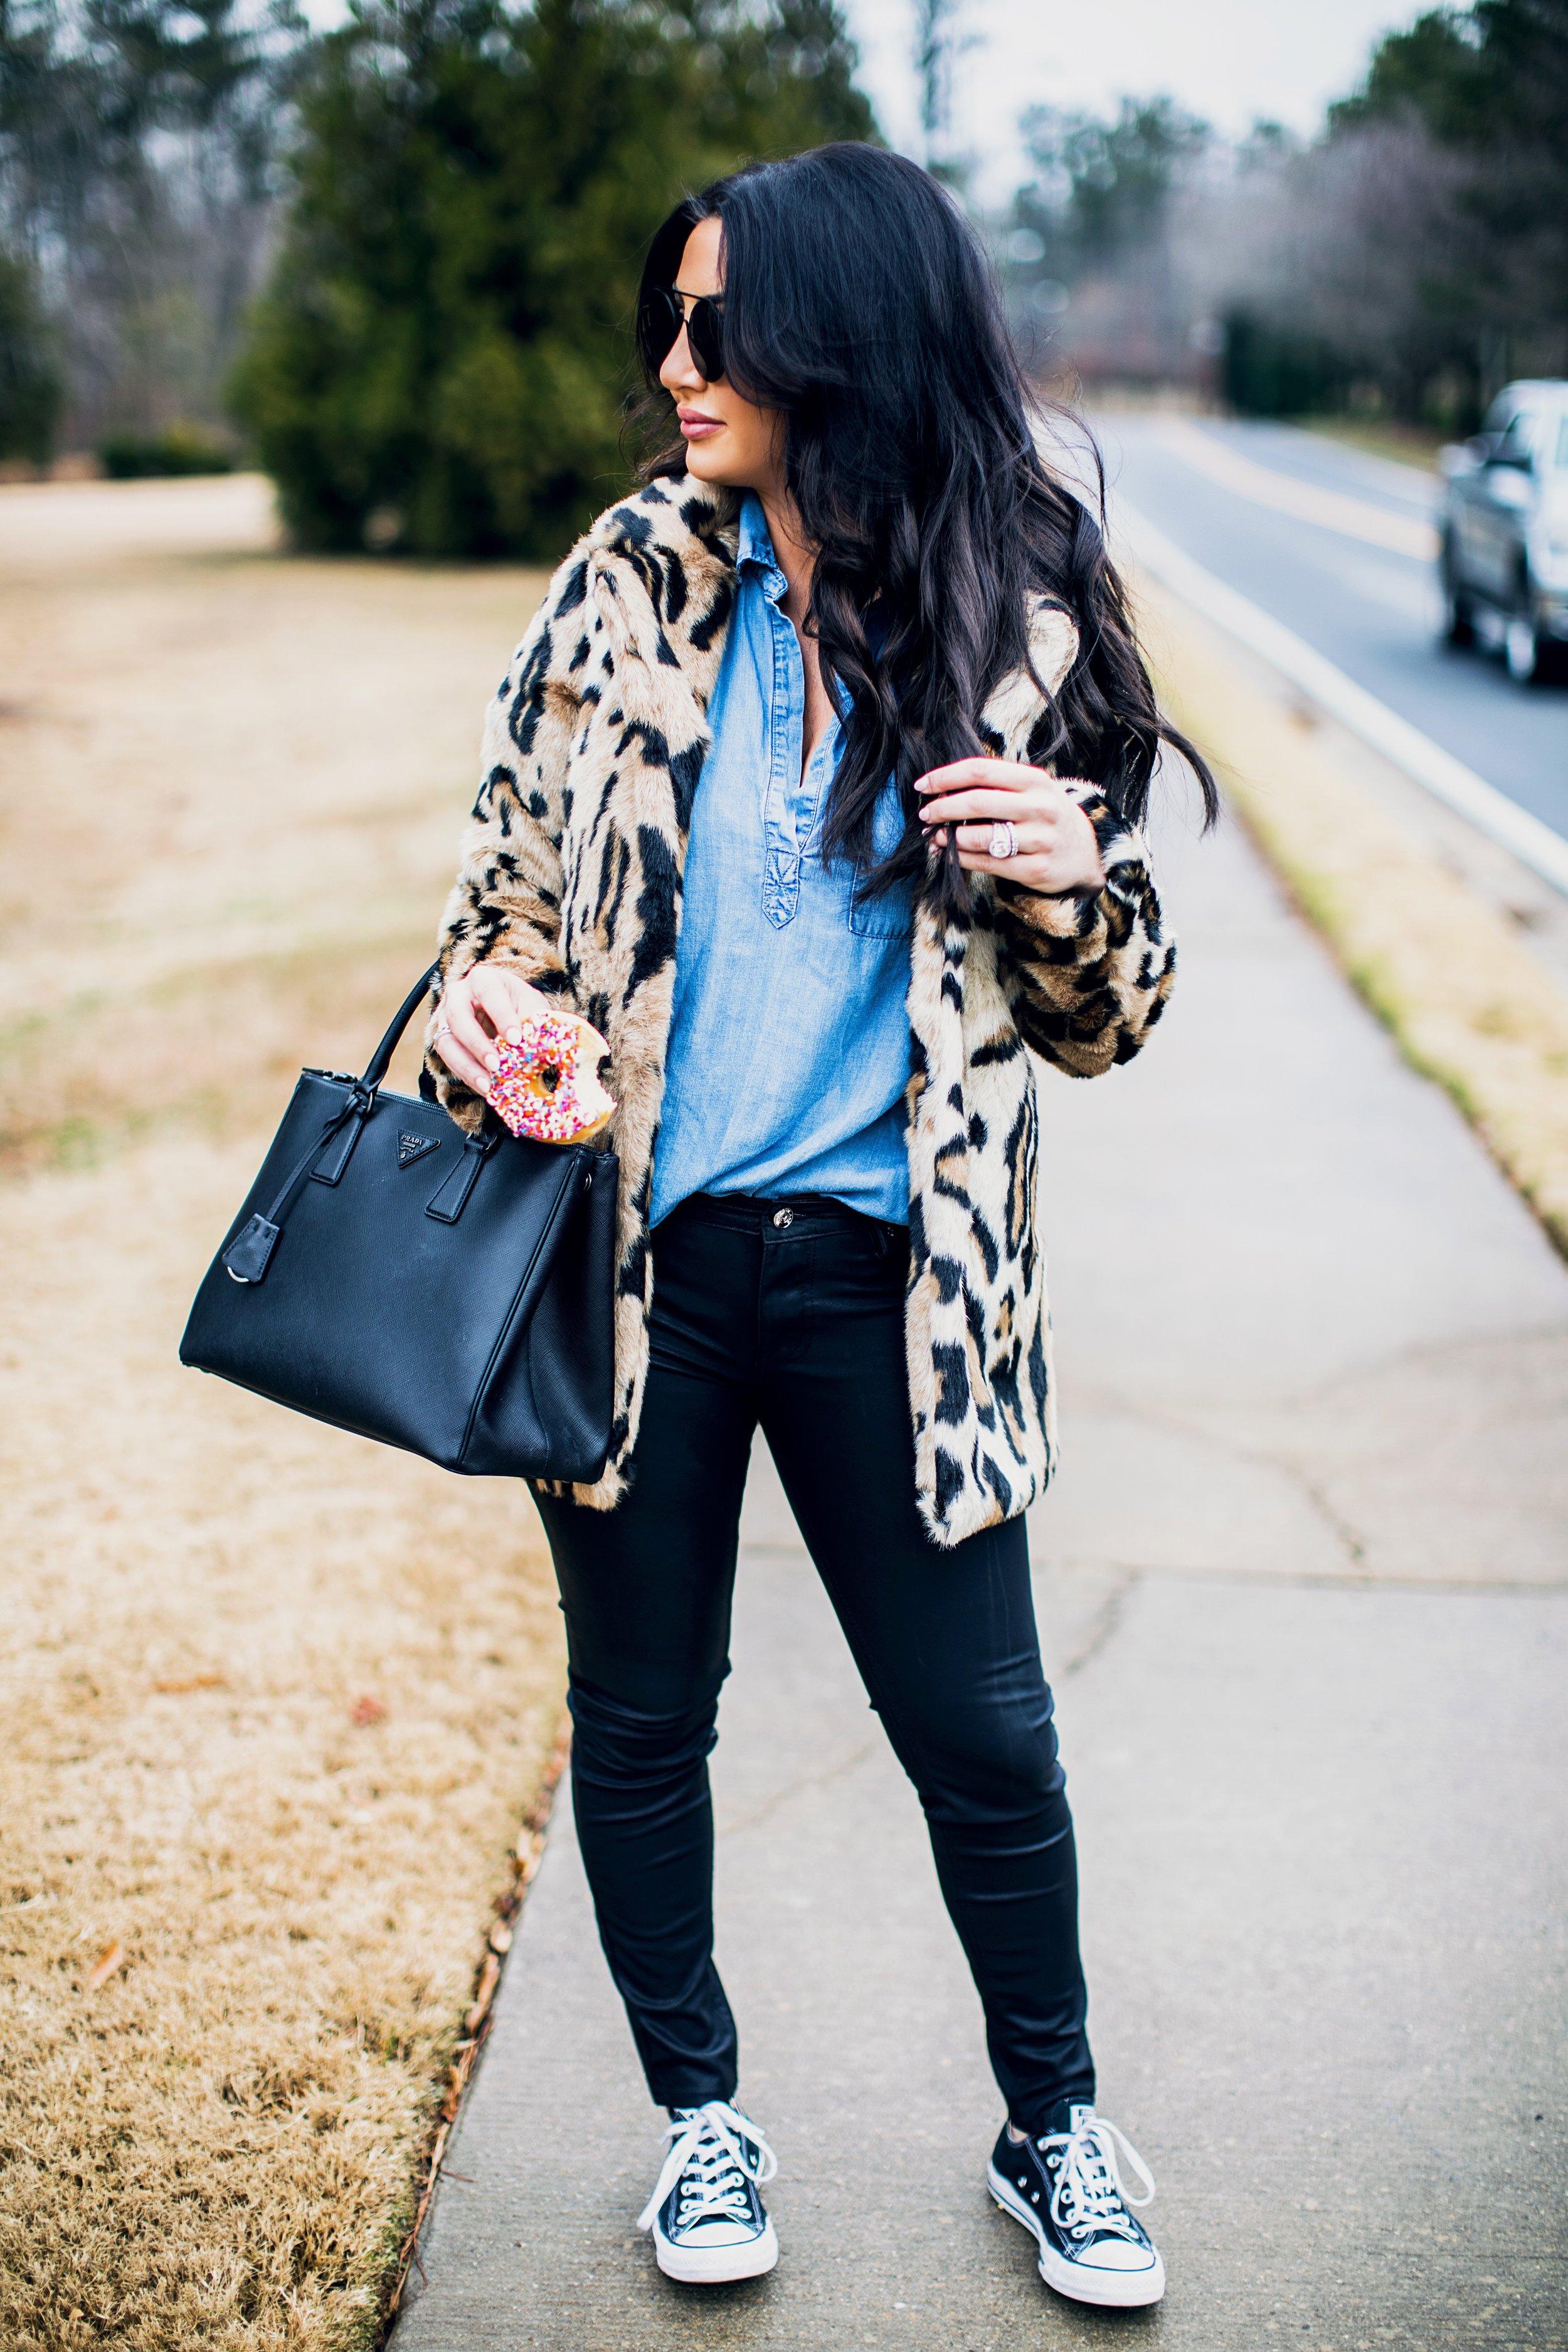 GoingGosnell.FashionBlogger.Atlanta.SarahGosnell.JPG